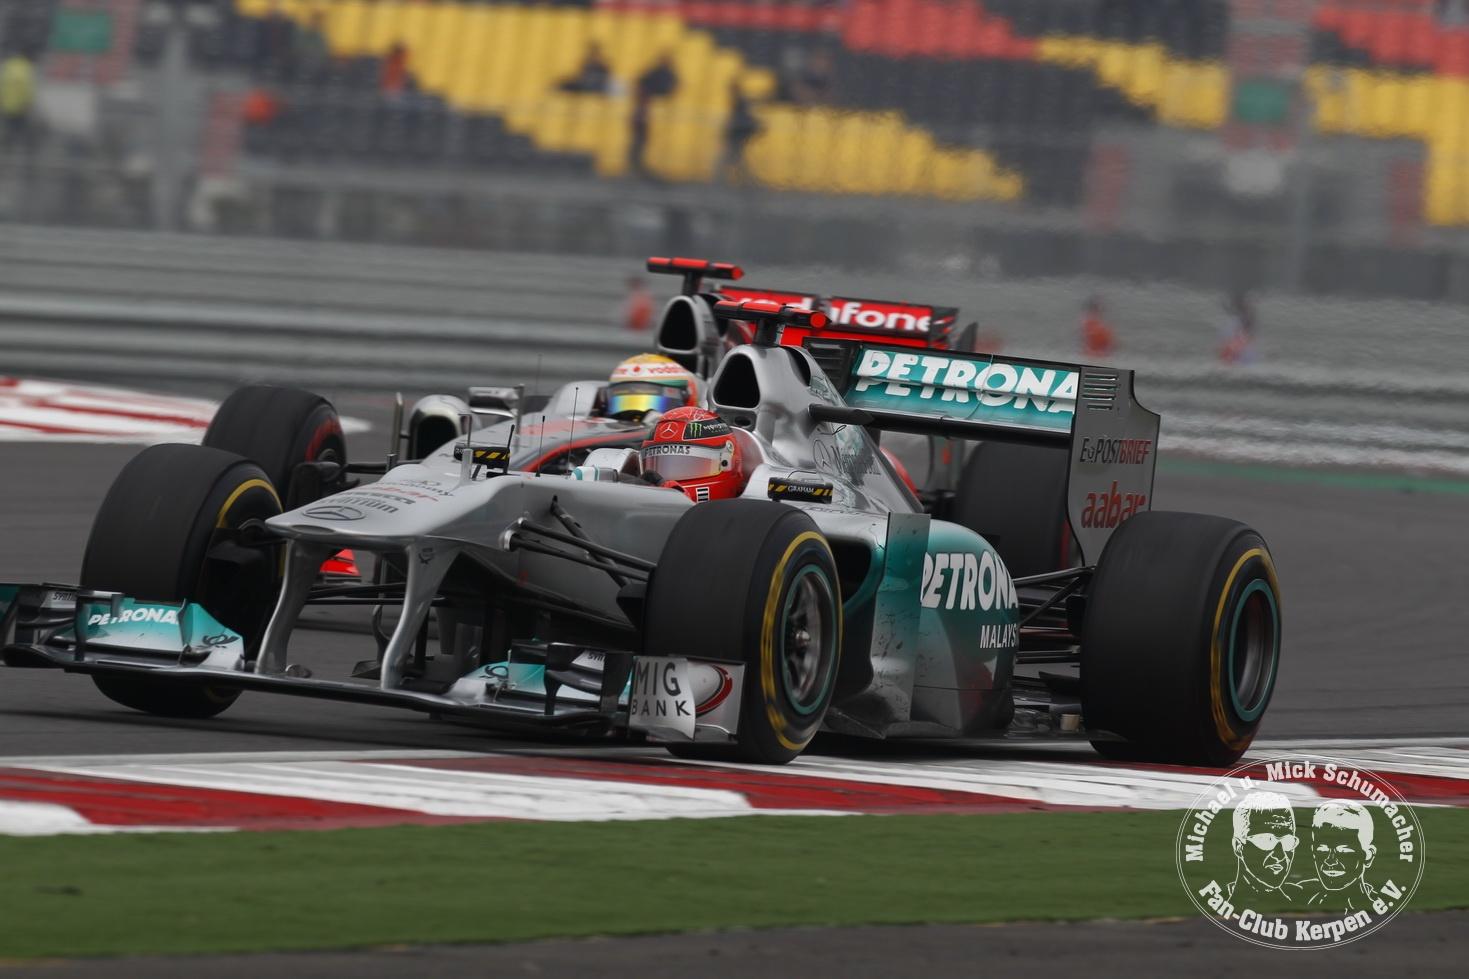 Formel 1, Grand Prix Korea 2011, Yeongam, 16.10.2011